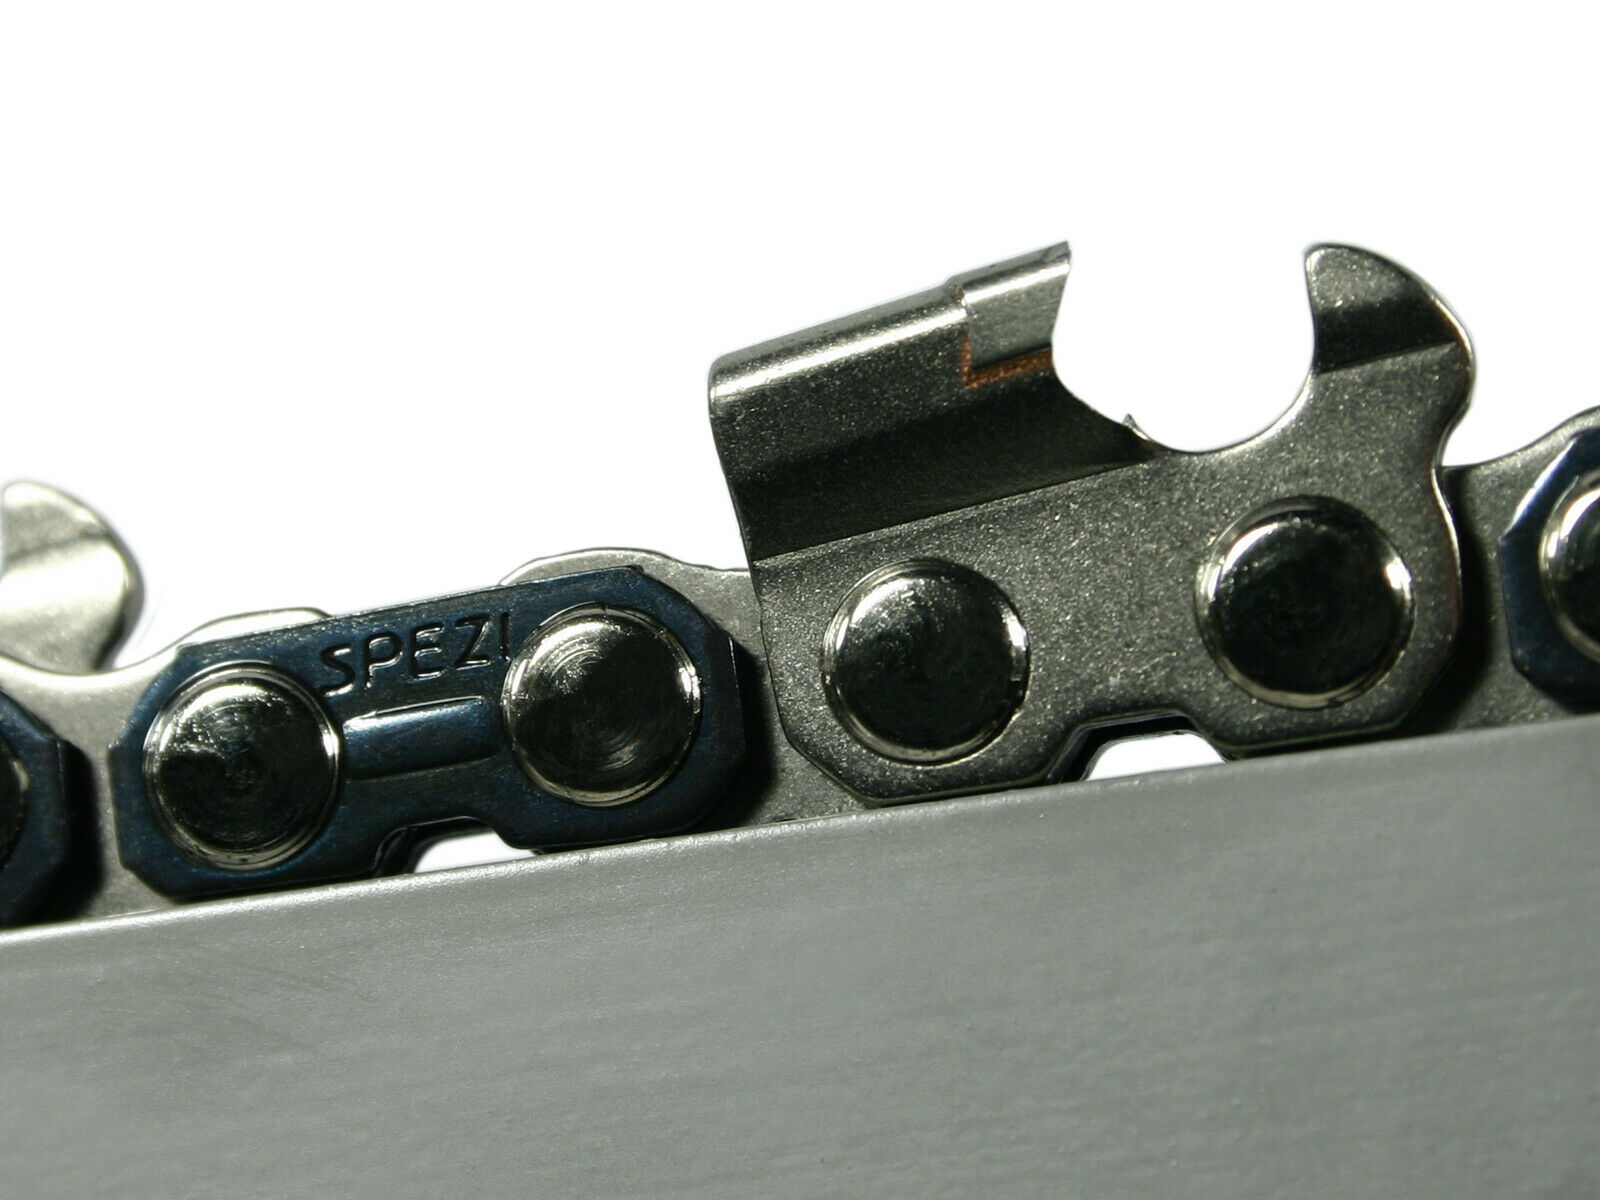 Metal duro para sierra cadena compatible con still 075 076 Av 90 cm 404  104 TG 1,6 mm Chain